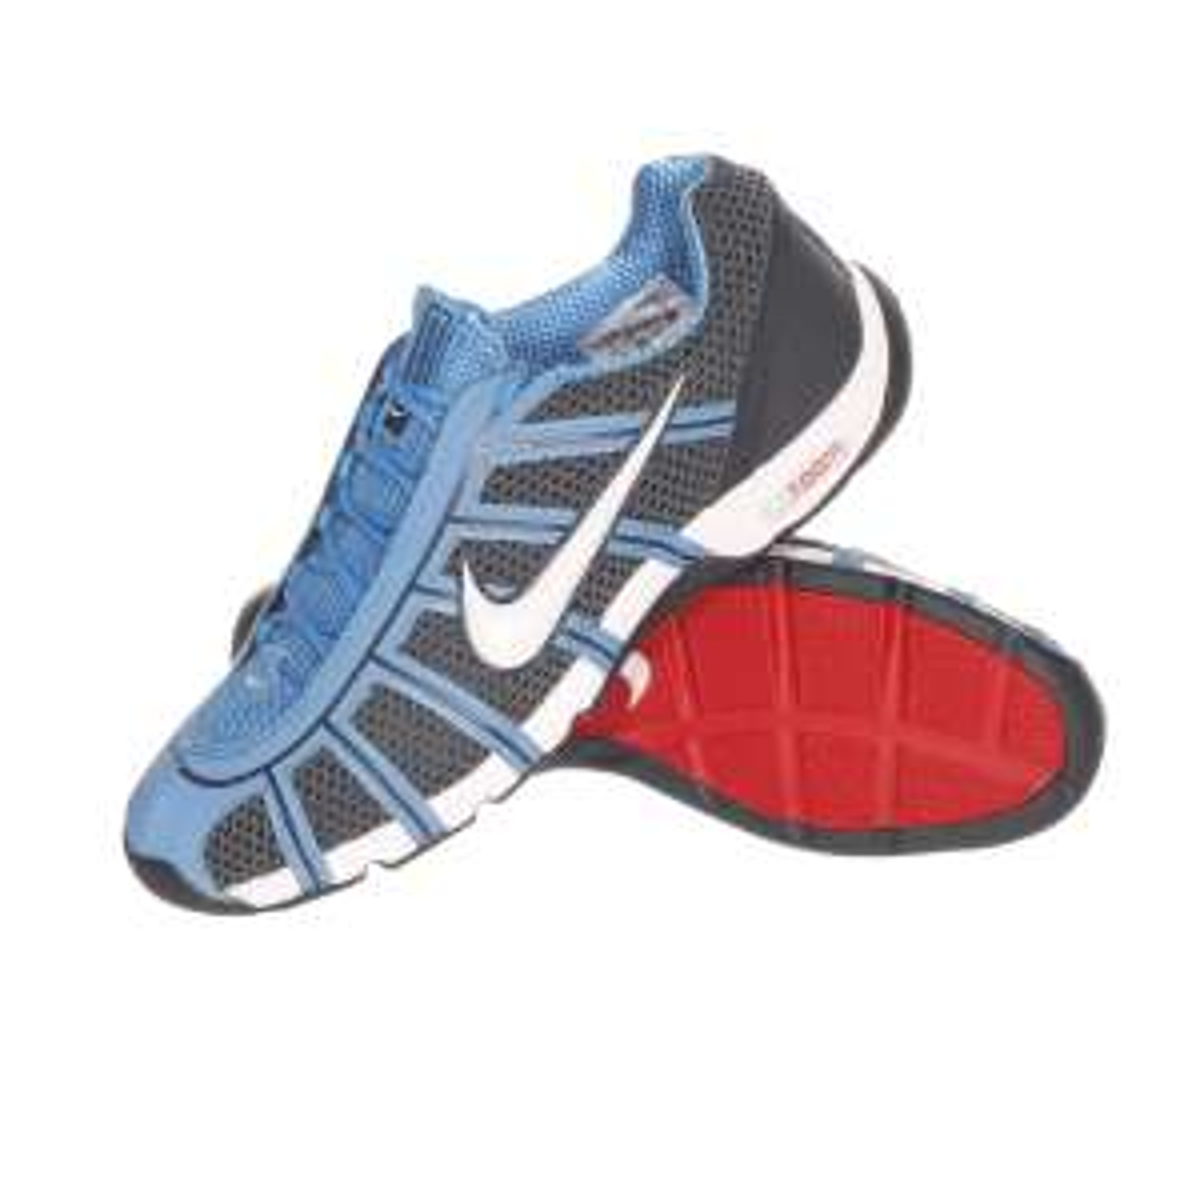 Chaussure d'escrime Nike Air Zoom Fencer - bleu (du 36.5 au 47.5) - RoyalEscrime.com